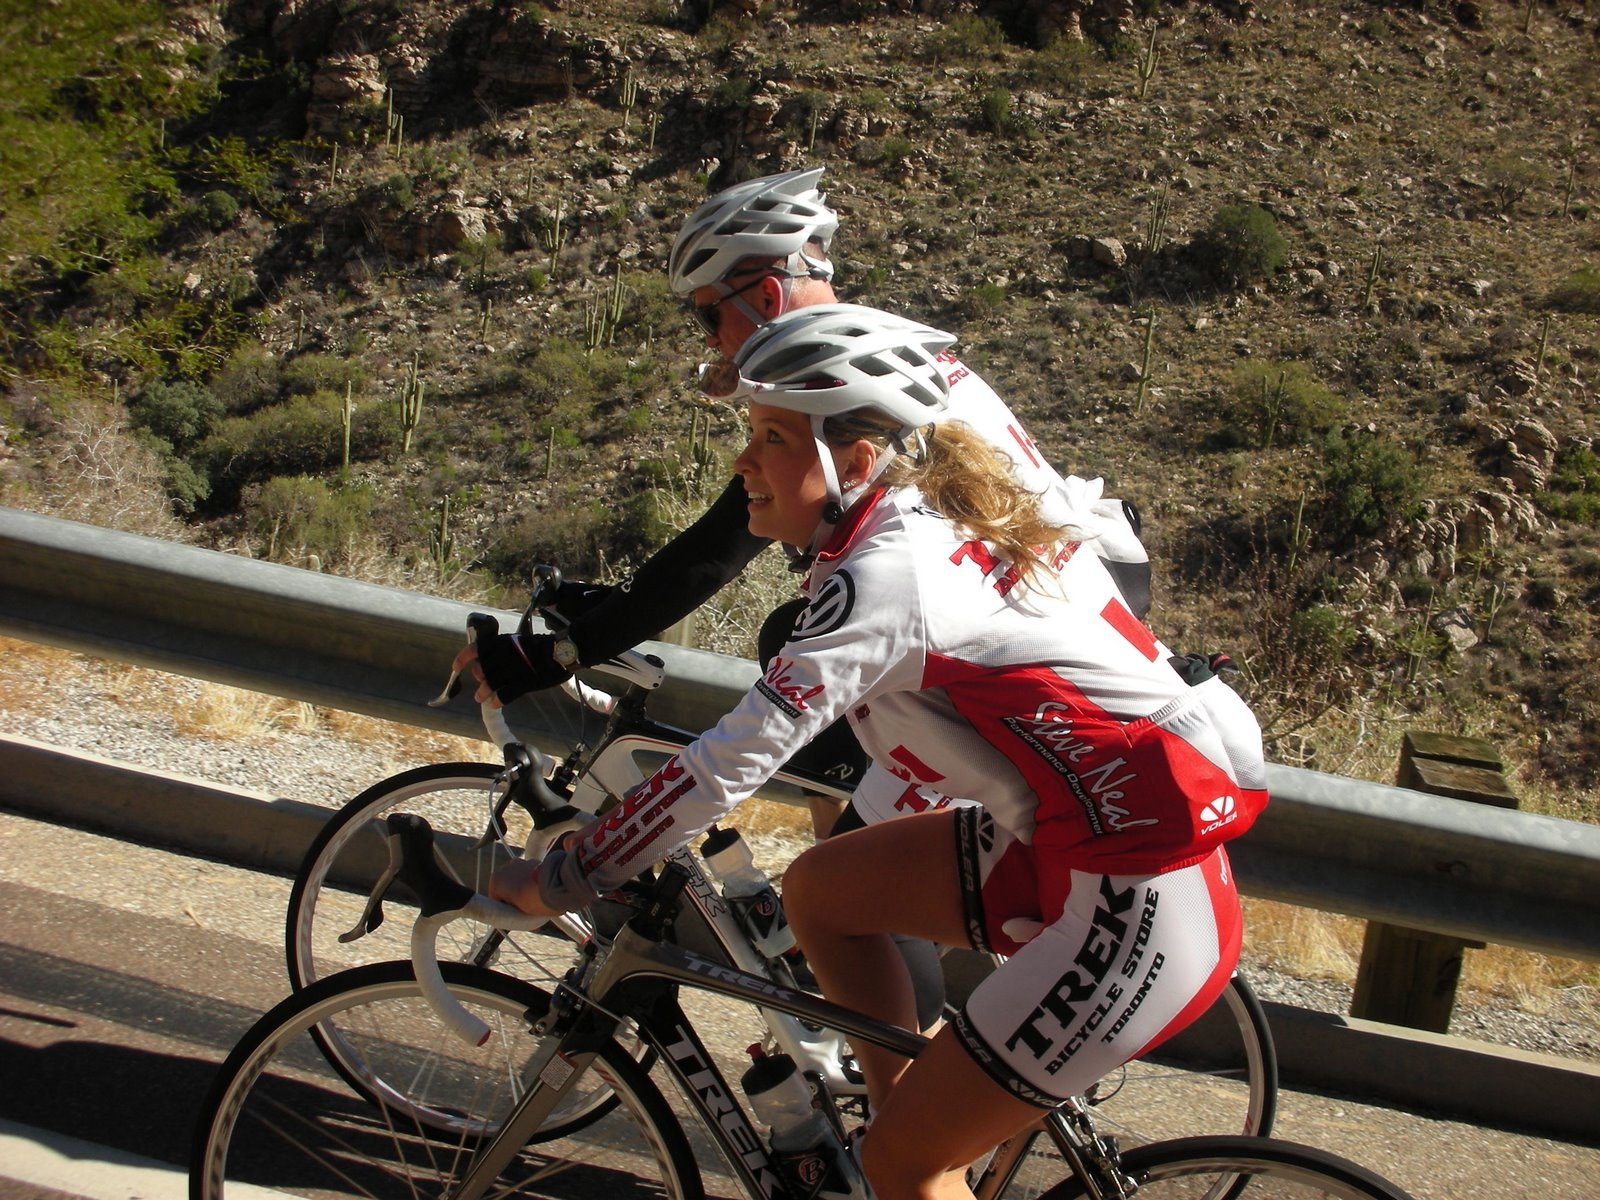 [Emily+Batty+Profile+Bike]